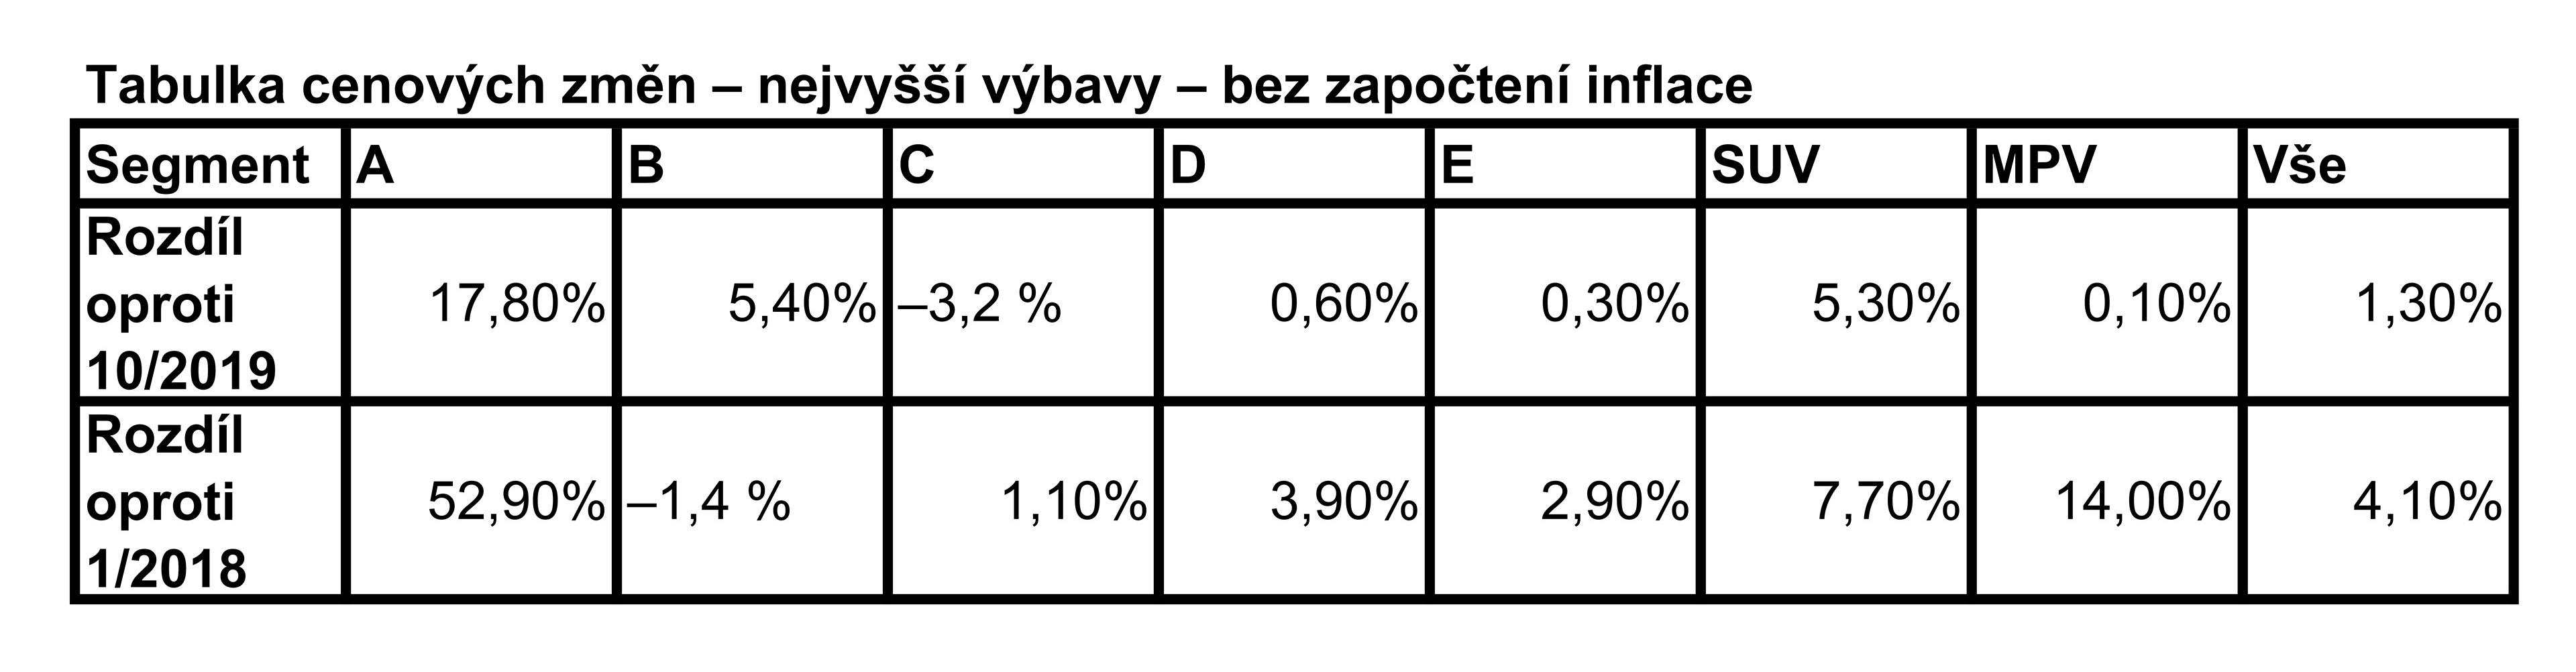 ey-tabulka-2-cenovy-index-ey-vice-nez-polovina-automobil-na-trhu-zdrazila